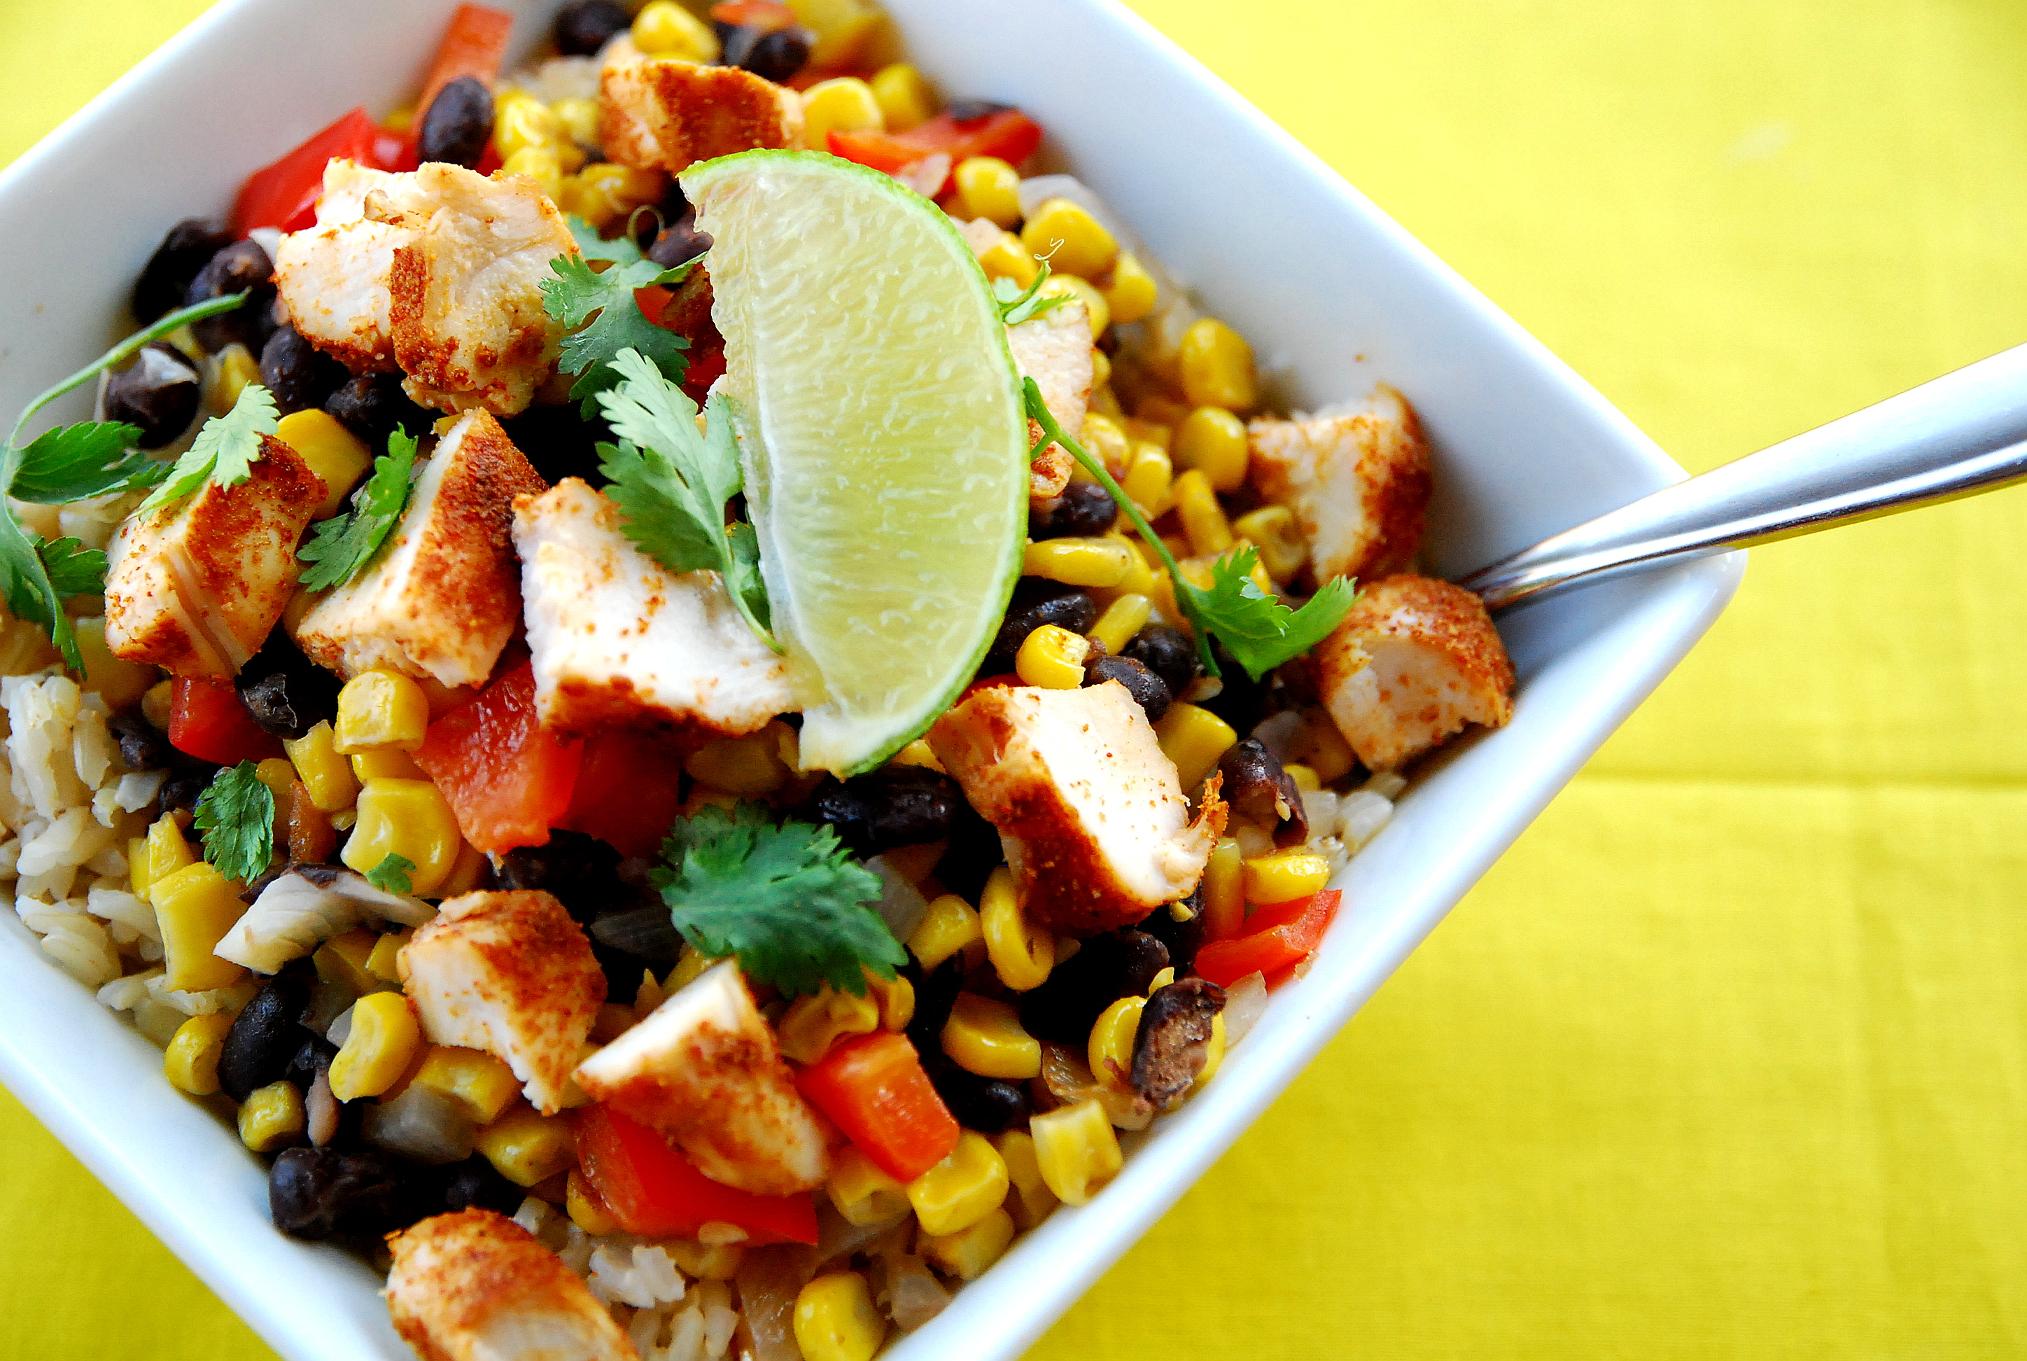 Chipotle Copycat: Chicken Burrito Bowls